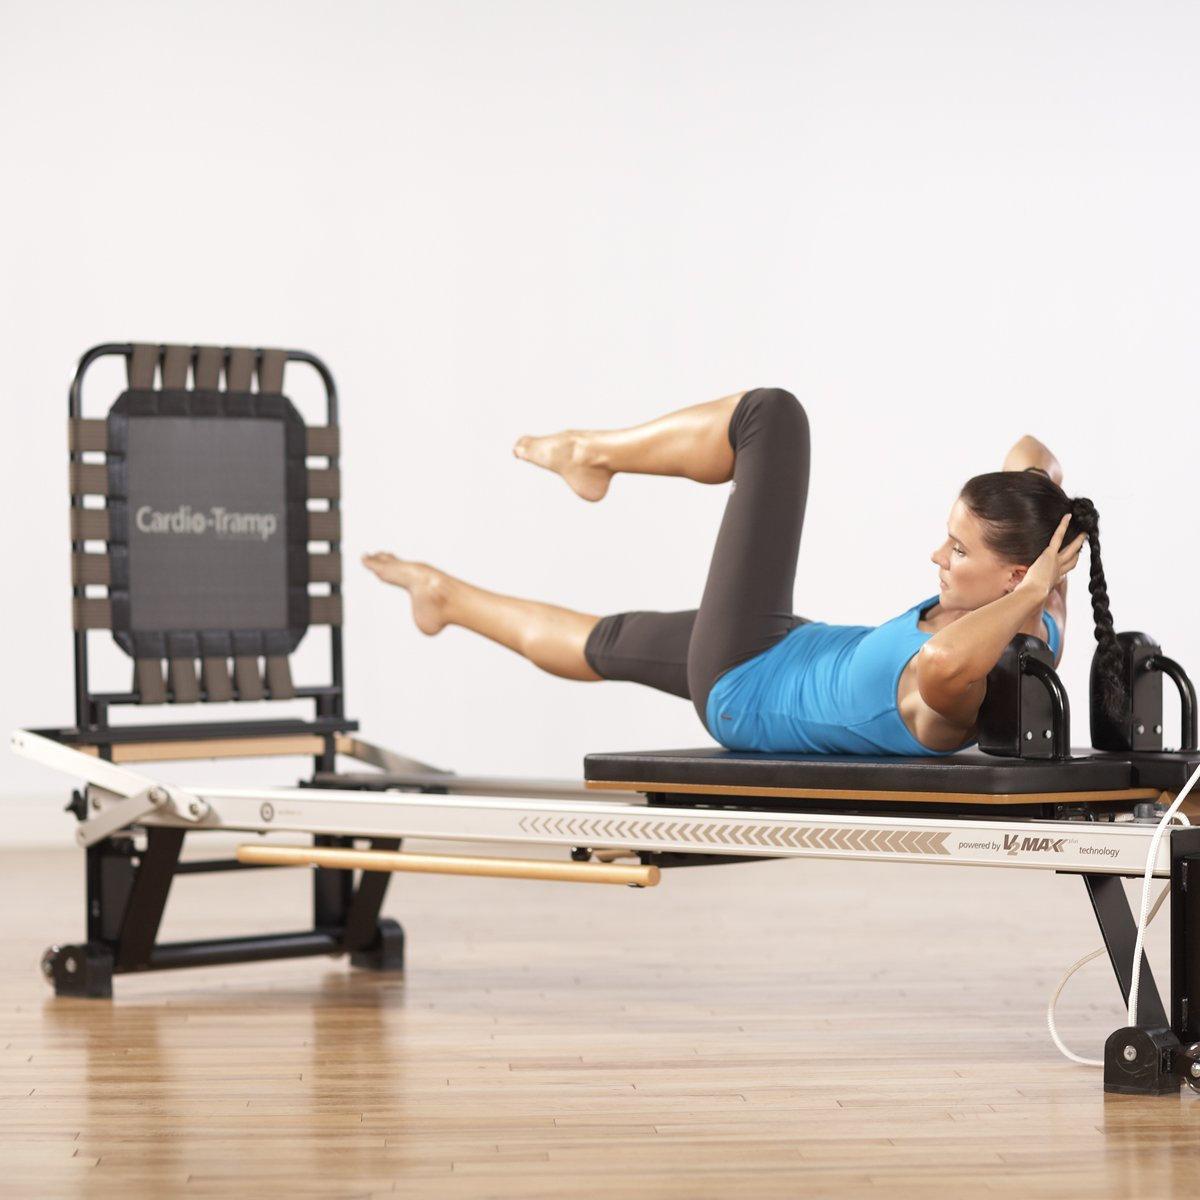 Pilates Reformer - $100 value